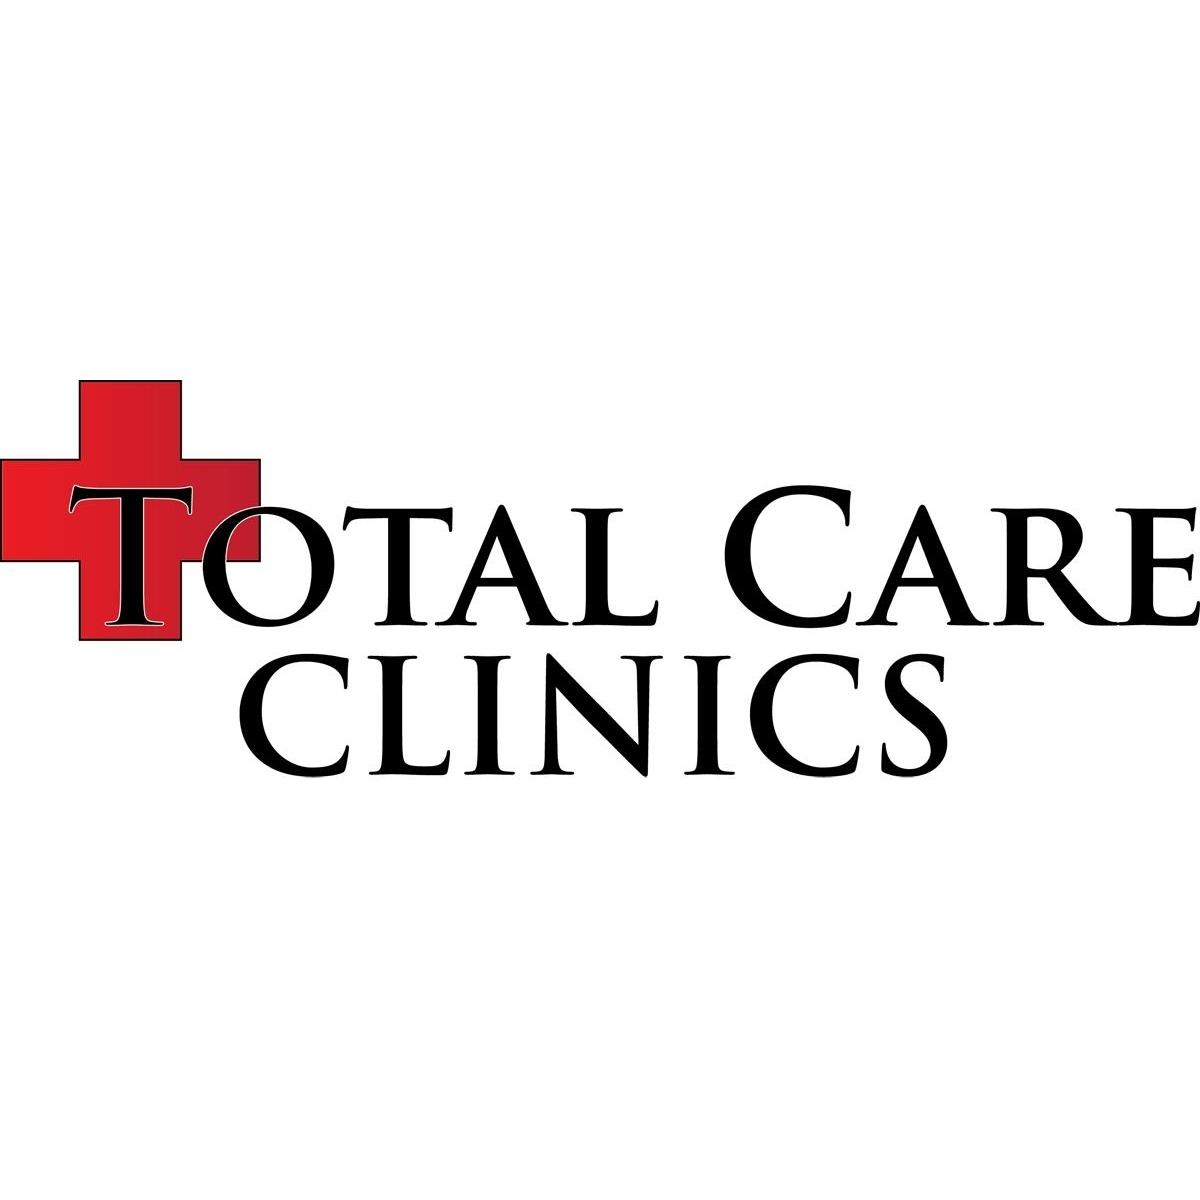 Total Care Clinics